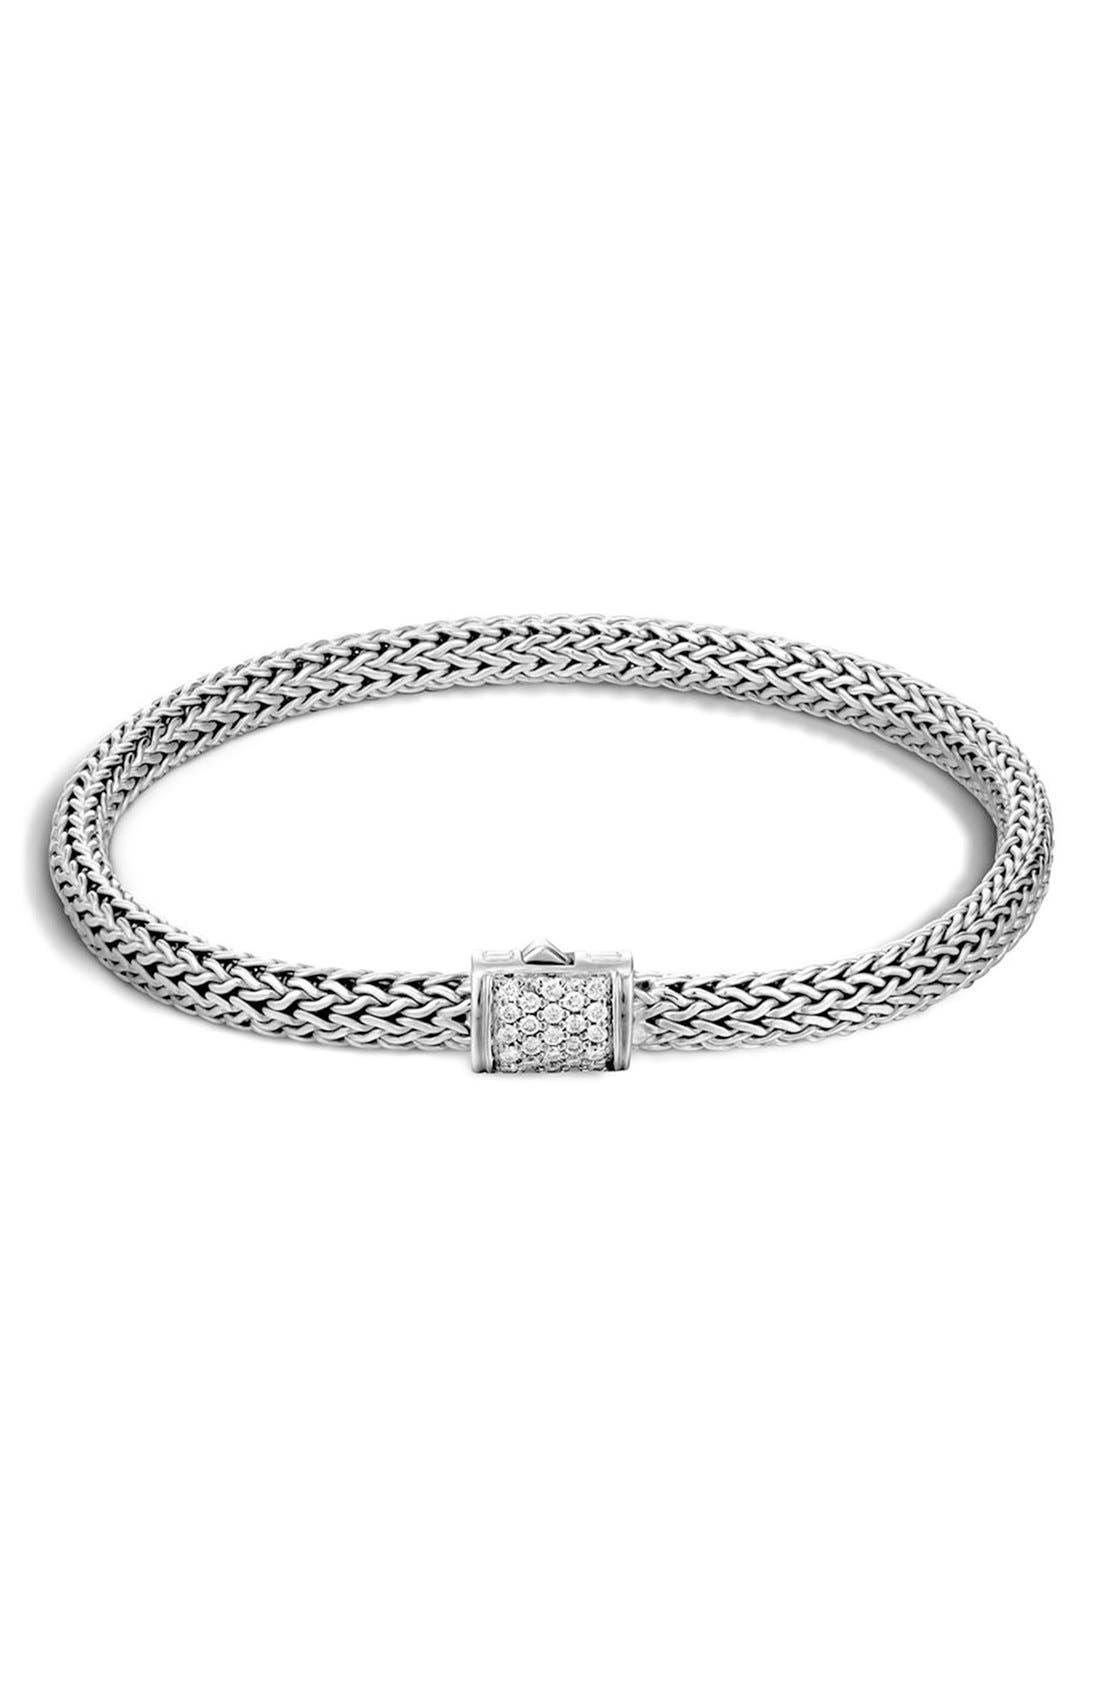 Main Image - John Hardy Extra Small Chain Bracelet with Diamond Clasp